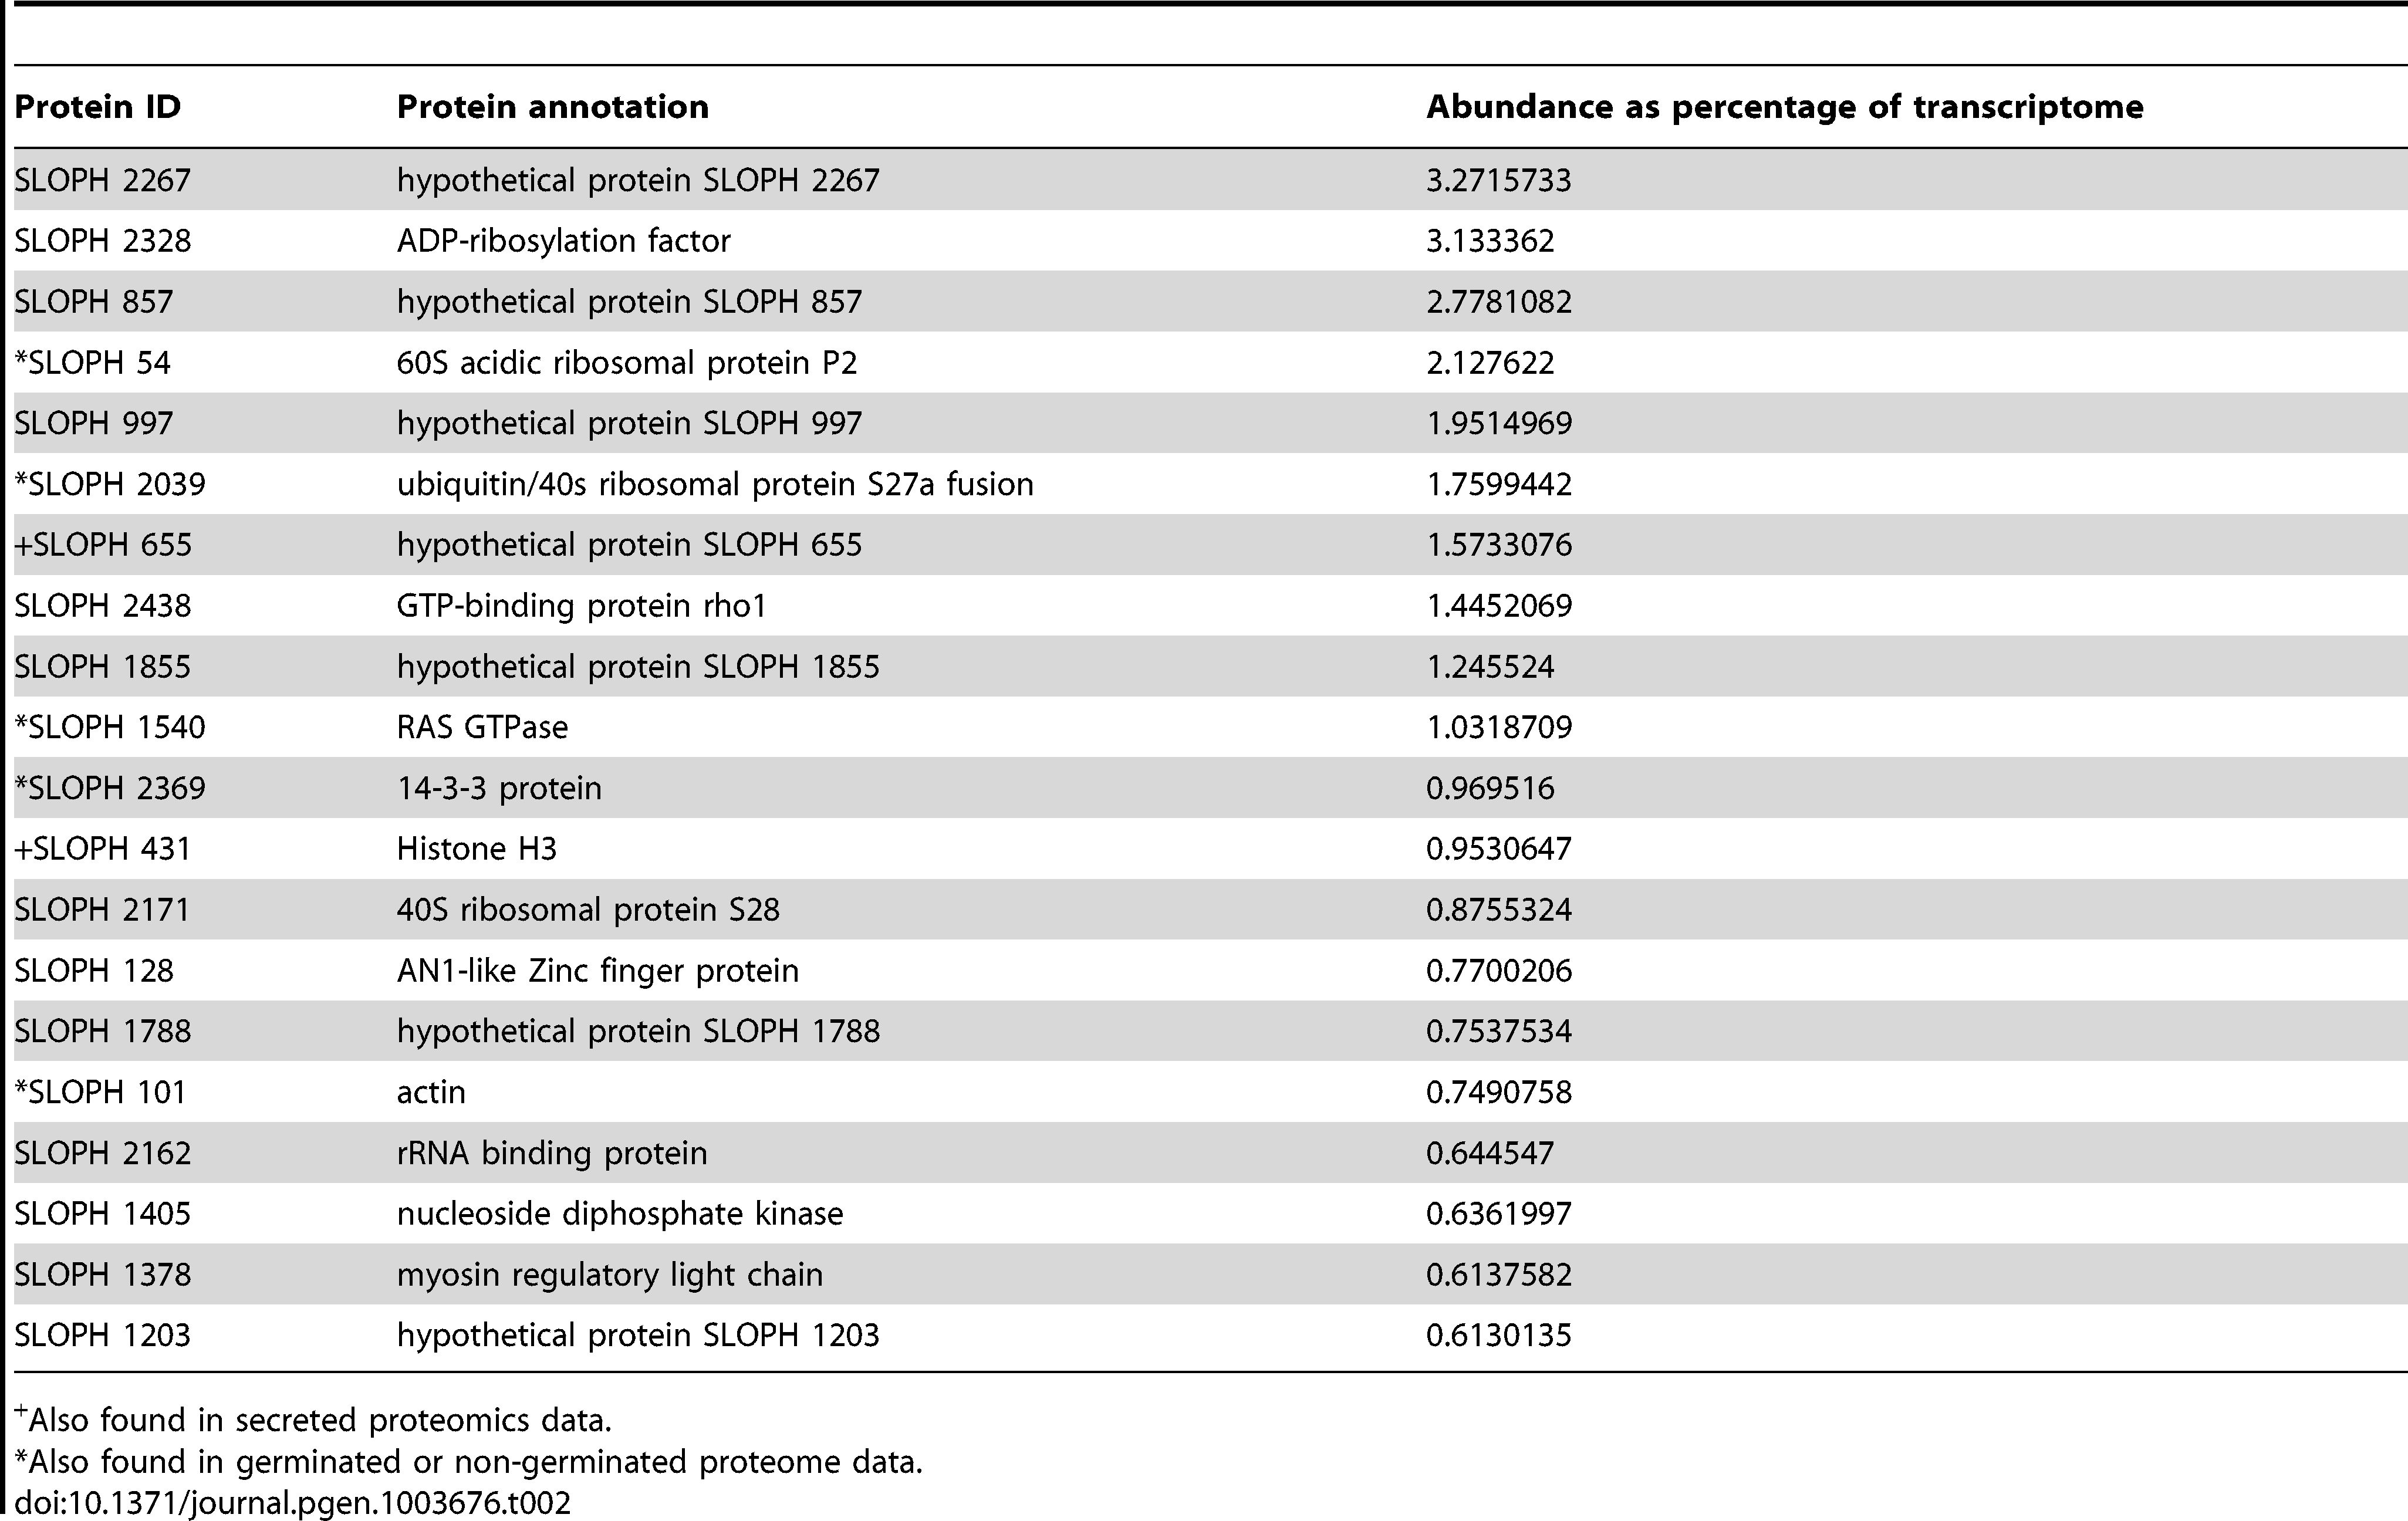 The twenty most abundant protein-coding transcripts in the <i>S. lophii</i> transcriptome.